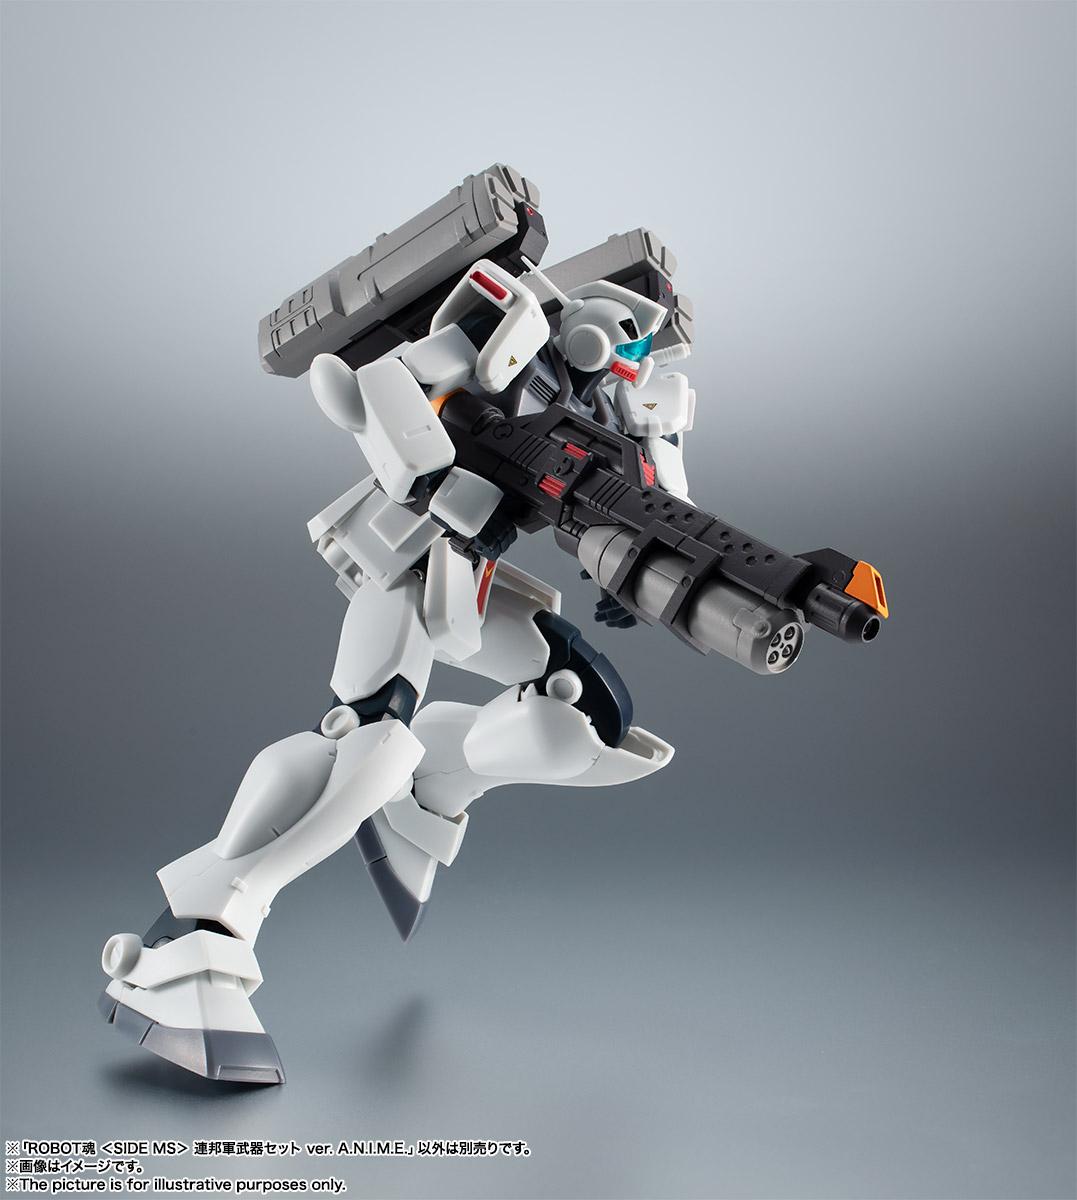 ROBOT魂〈SIDE MS〉『連邦軍武器セット ver. A.N.I.M.E.』ガンダム 完成品フィギュア-014